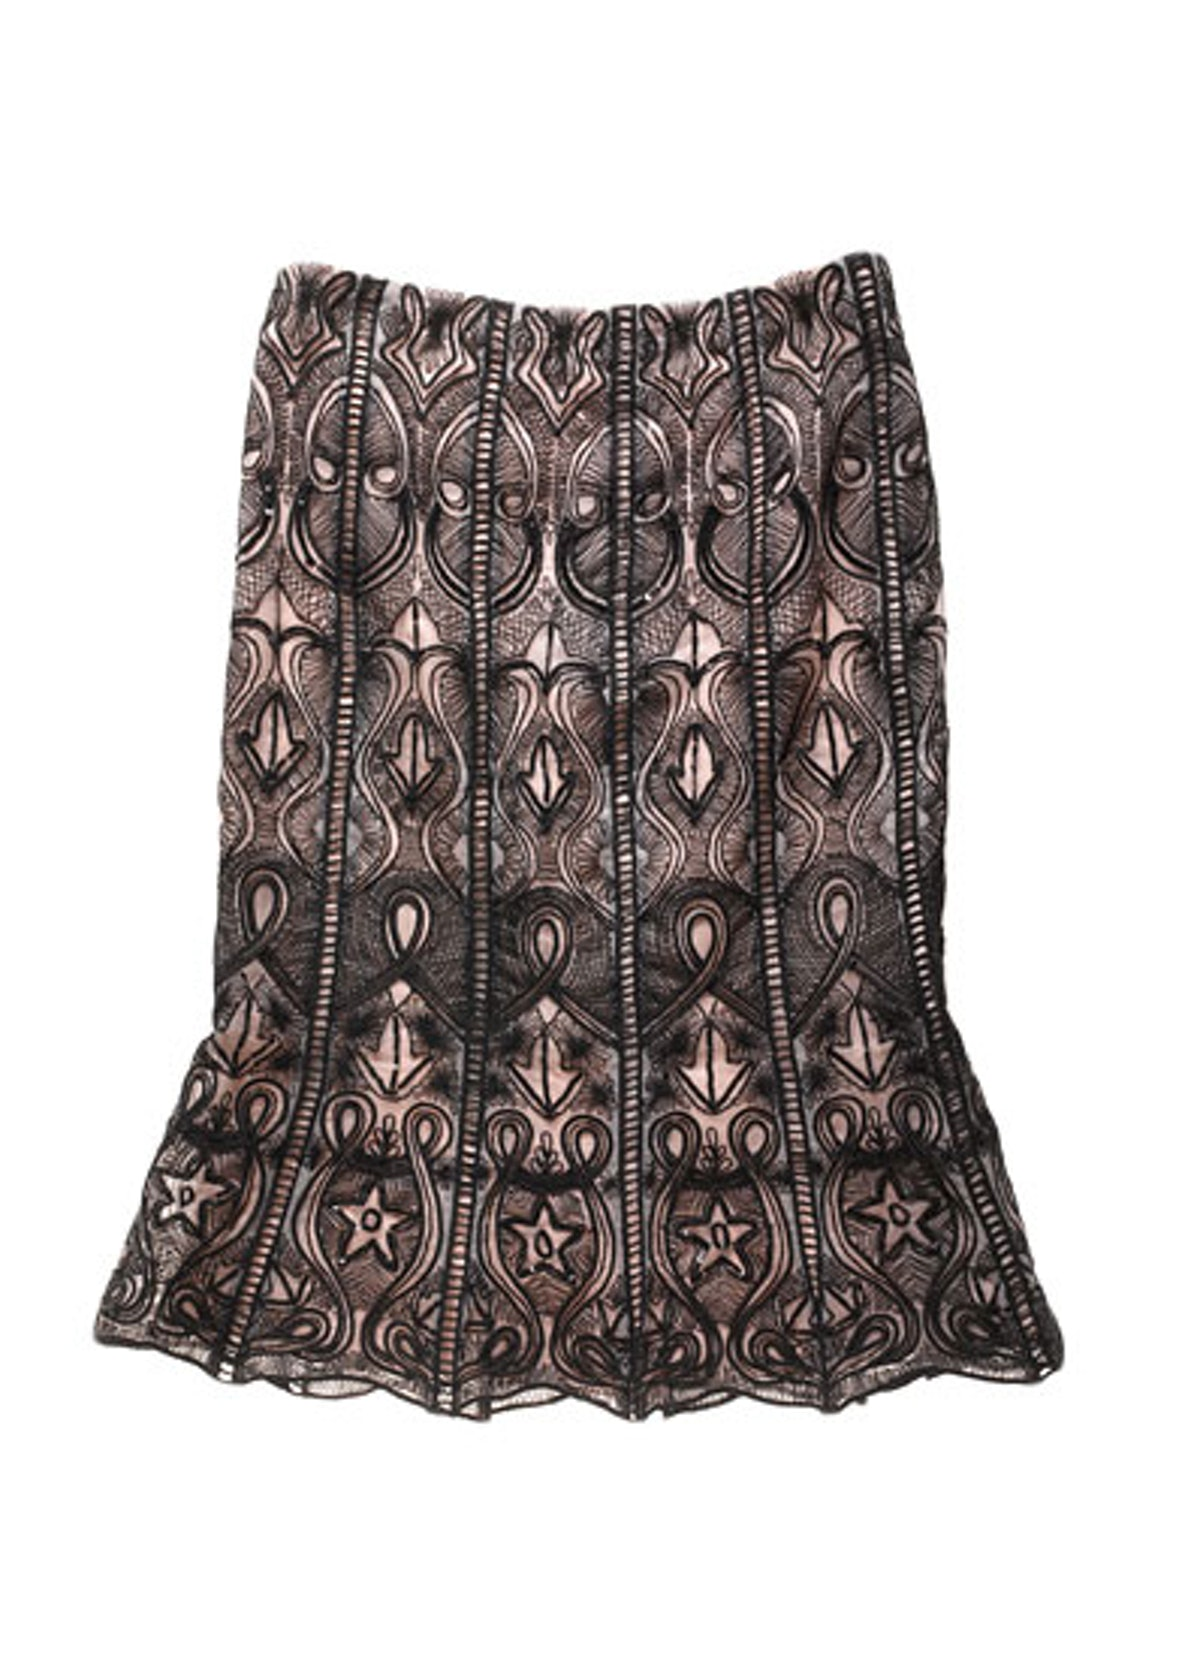 acss-baroque-accessories-10-v.jpg